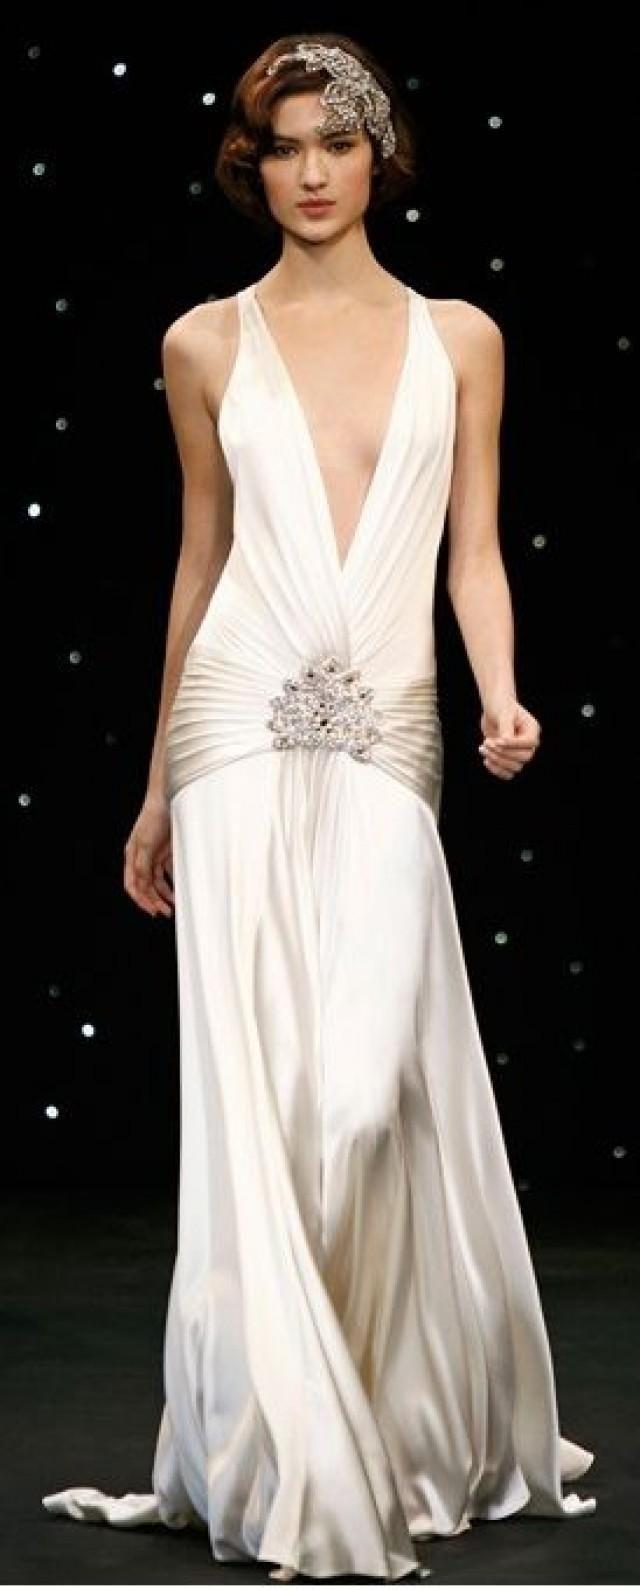 Weddings-Great Gatsby Blanka Matragi